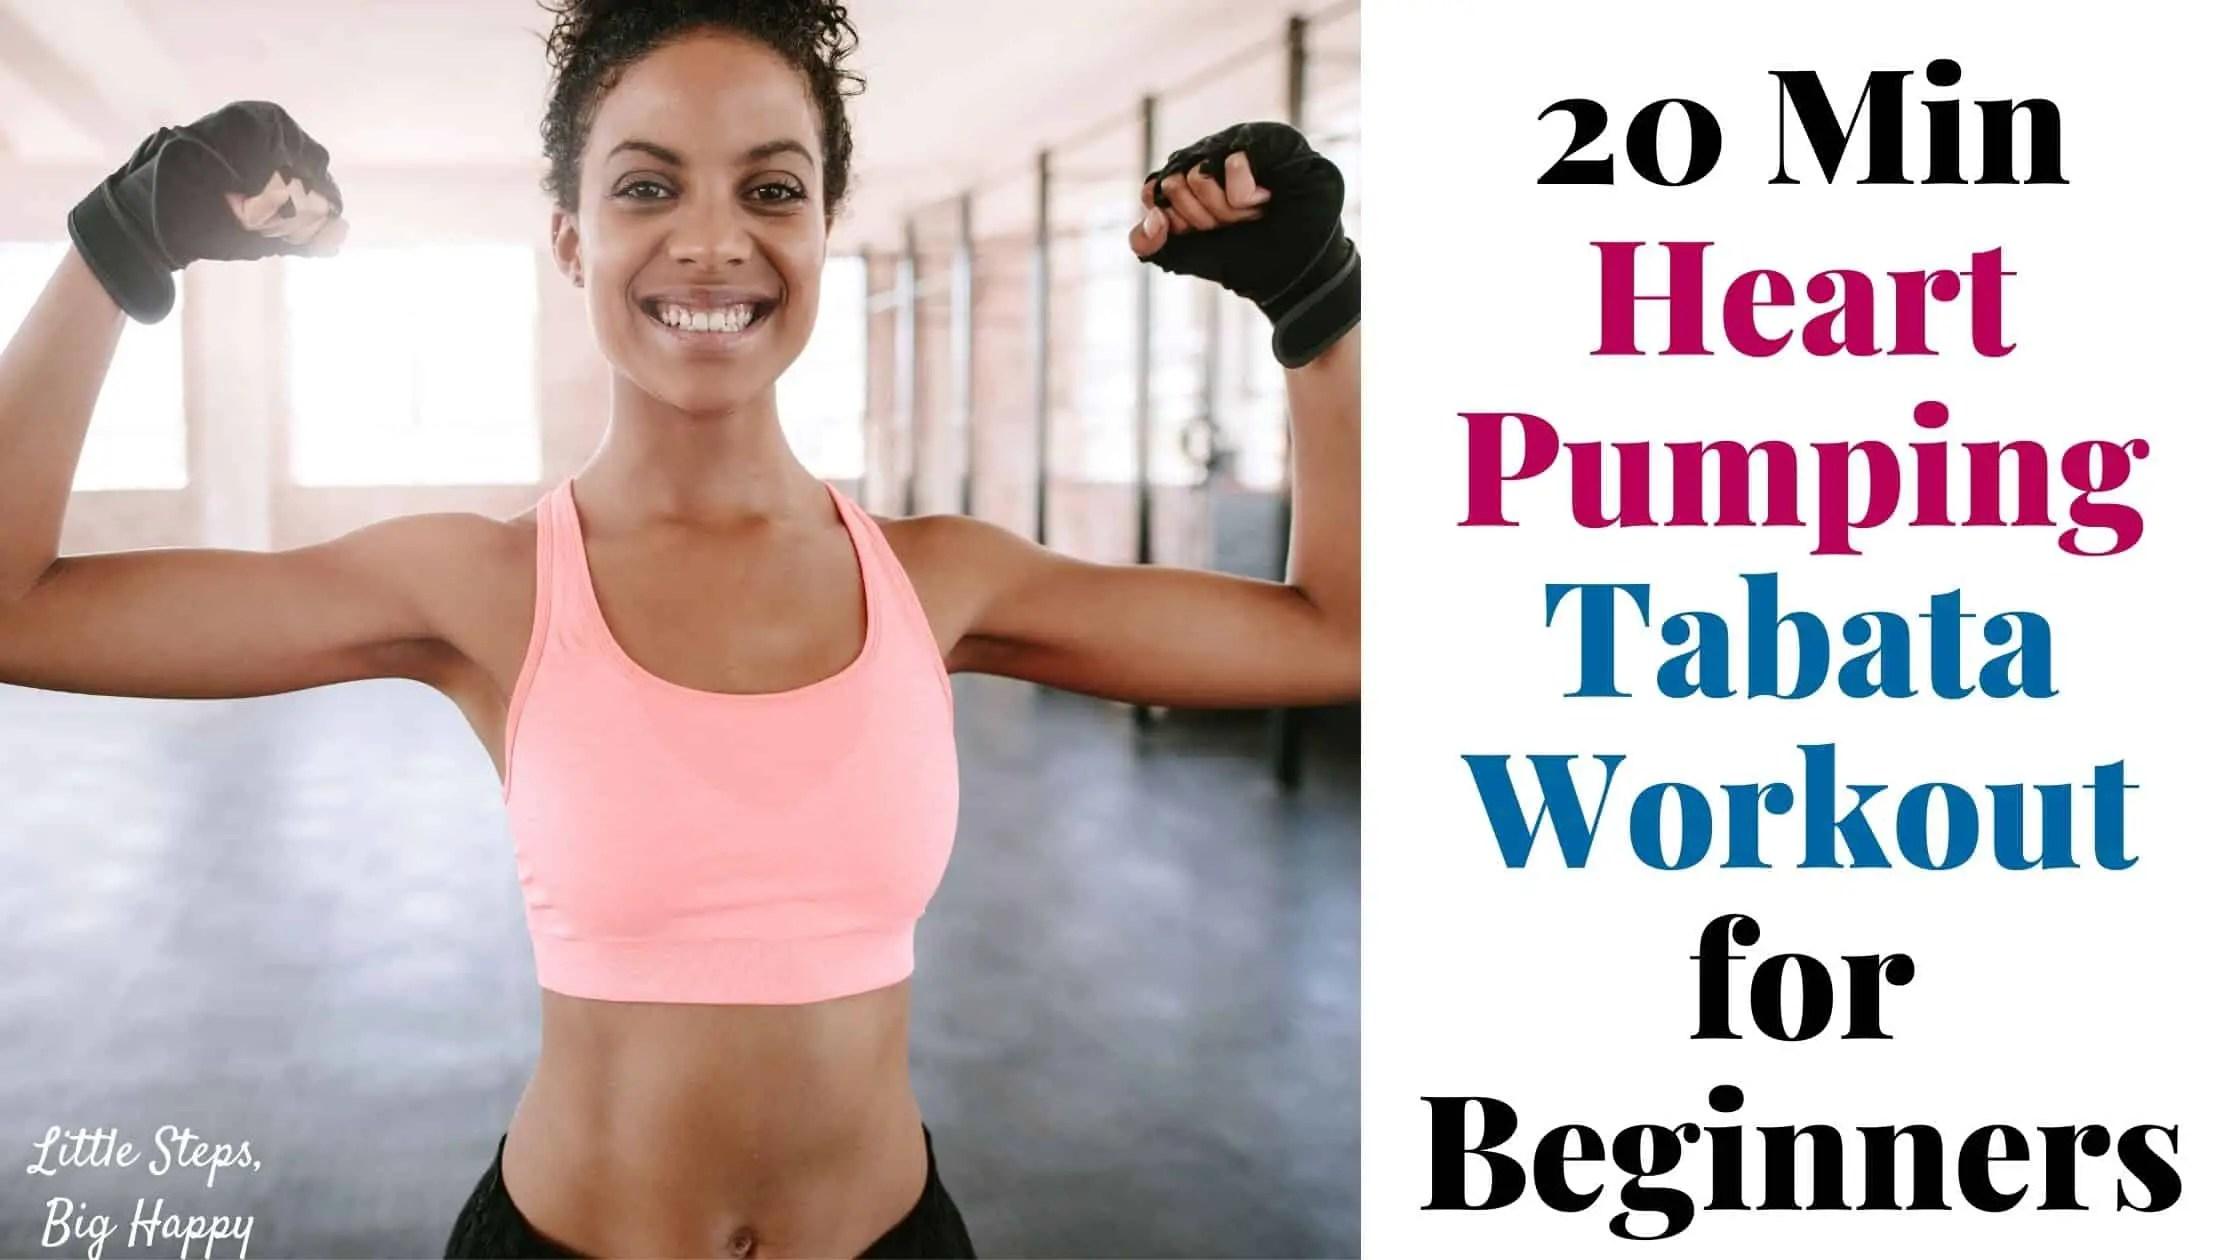 20 Min Heart Pumping Tabata Workout for Beginners